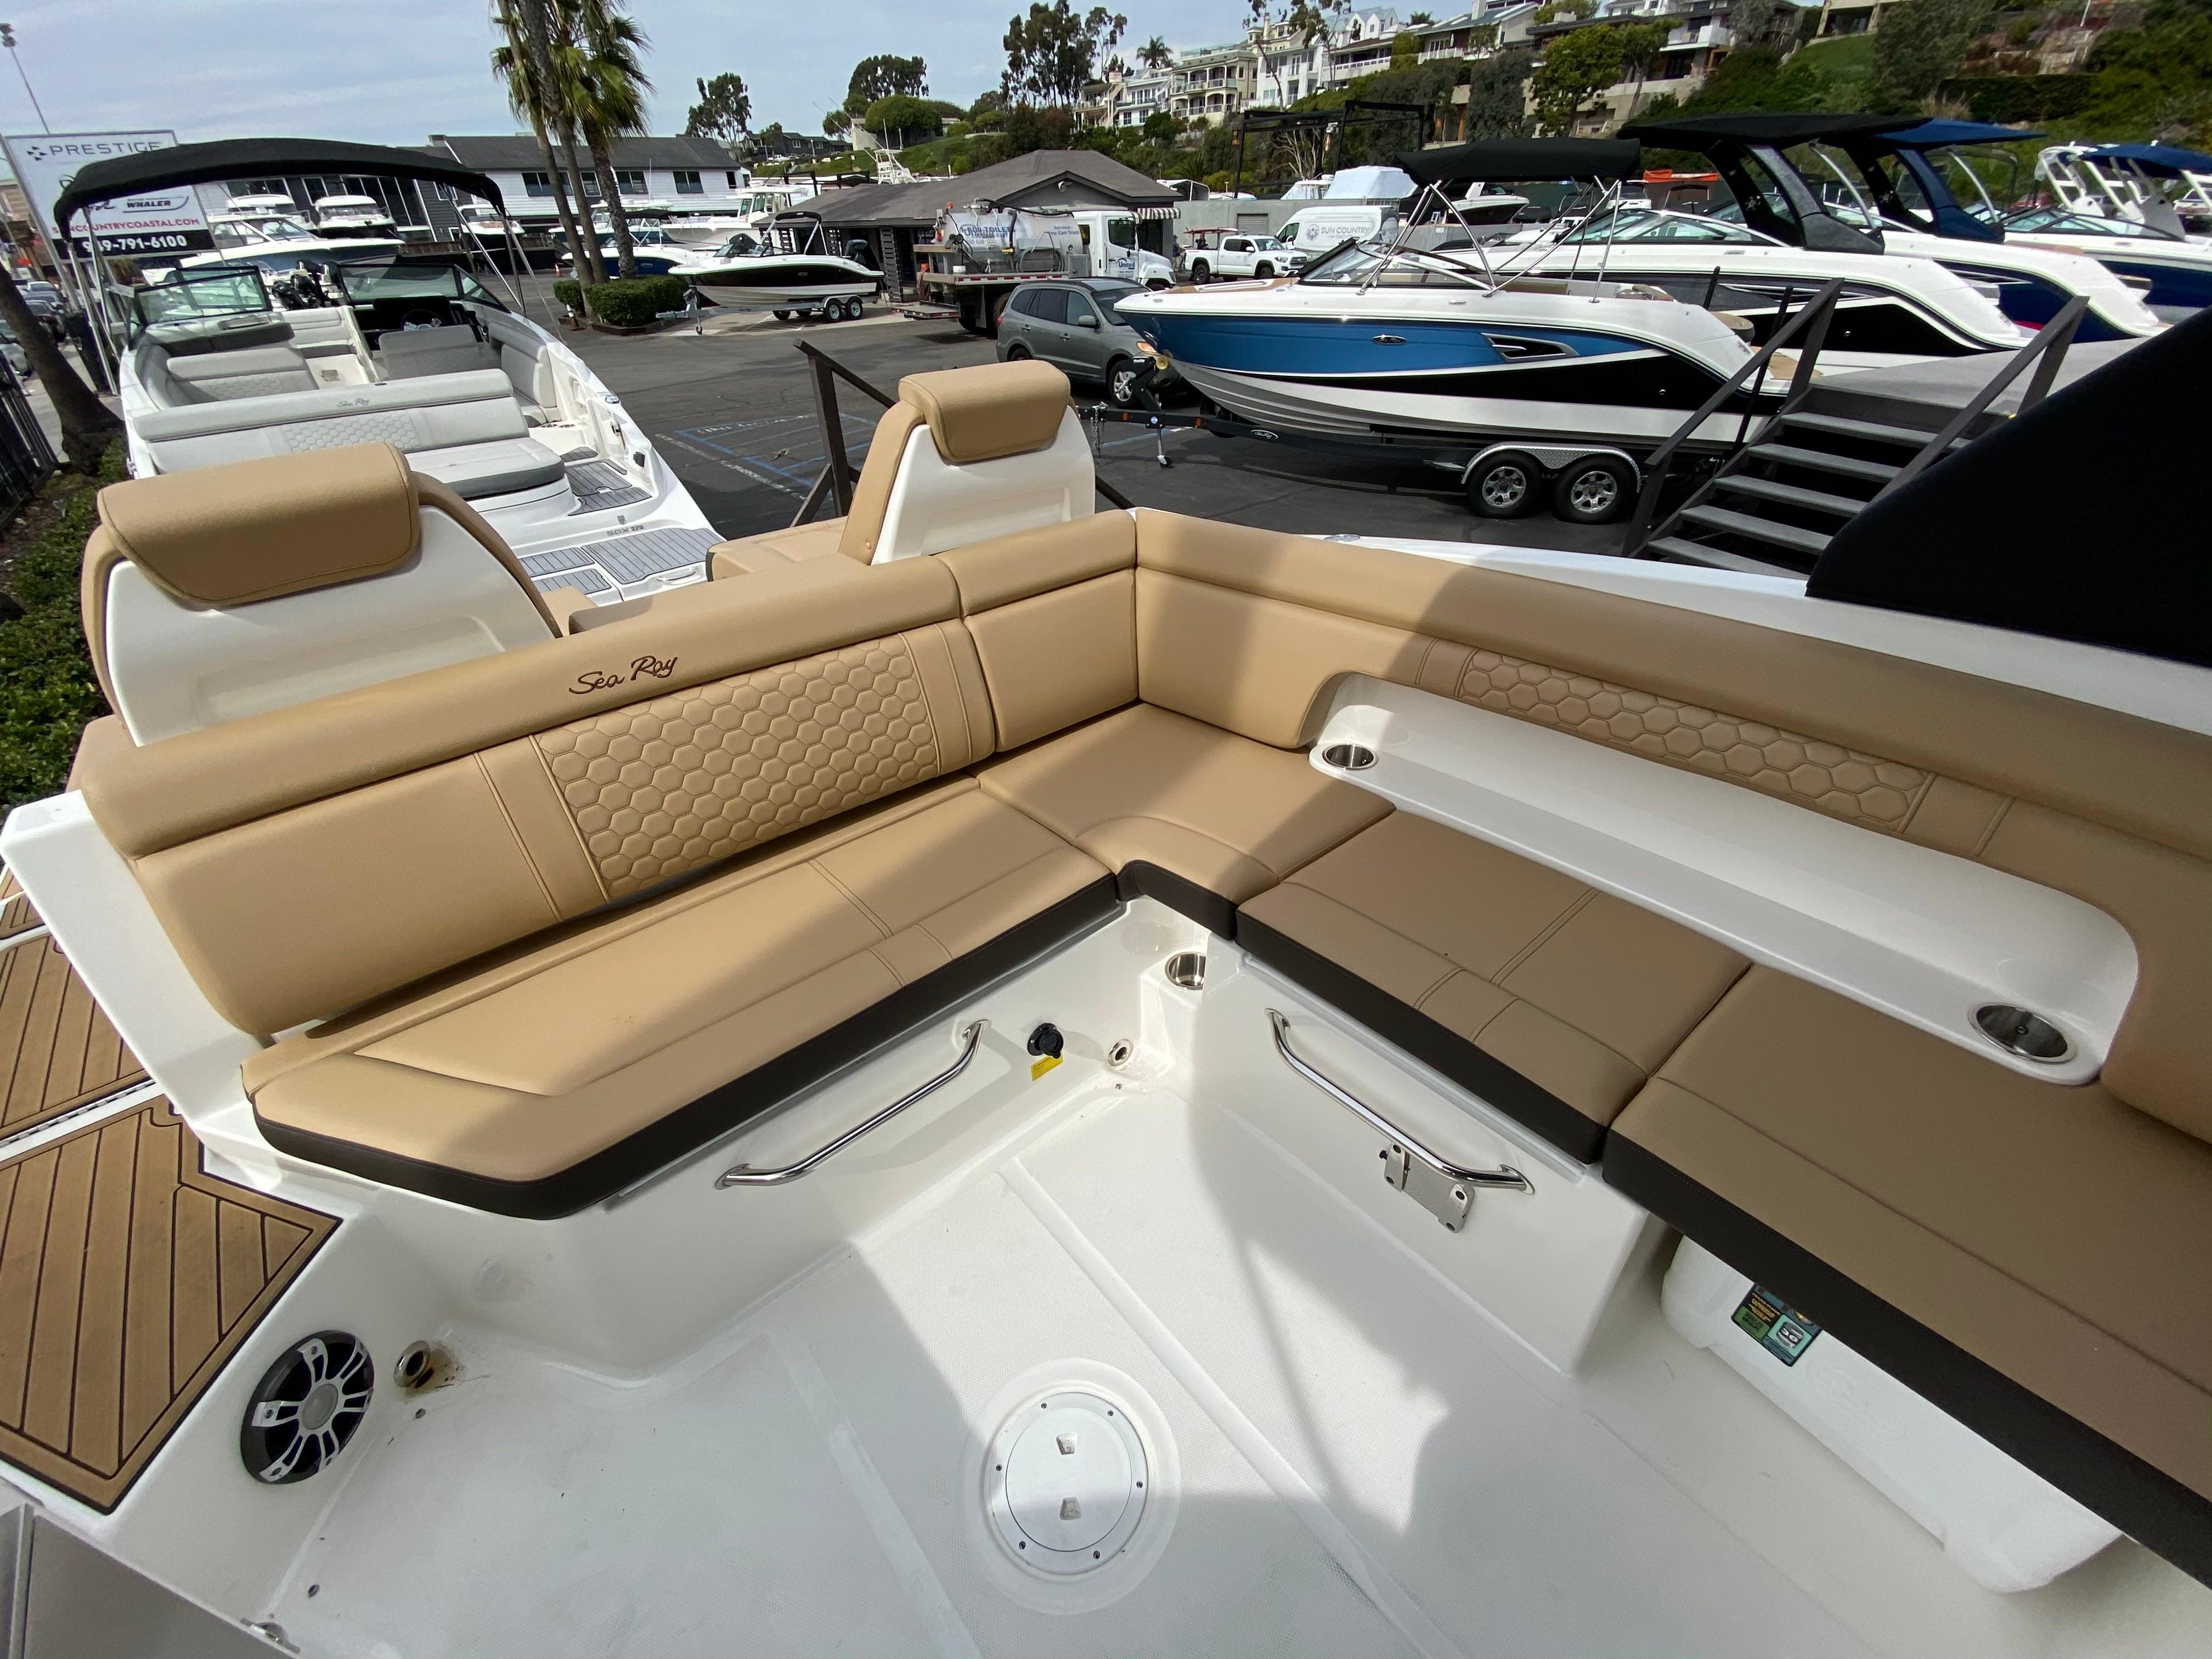 2020 Sea Ray SDX 290 #S1649K inventory image at Sun Country Coastal in Newport Beach